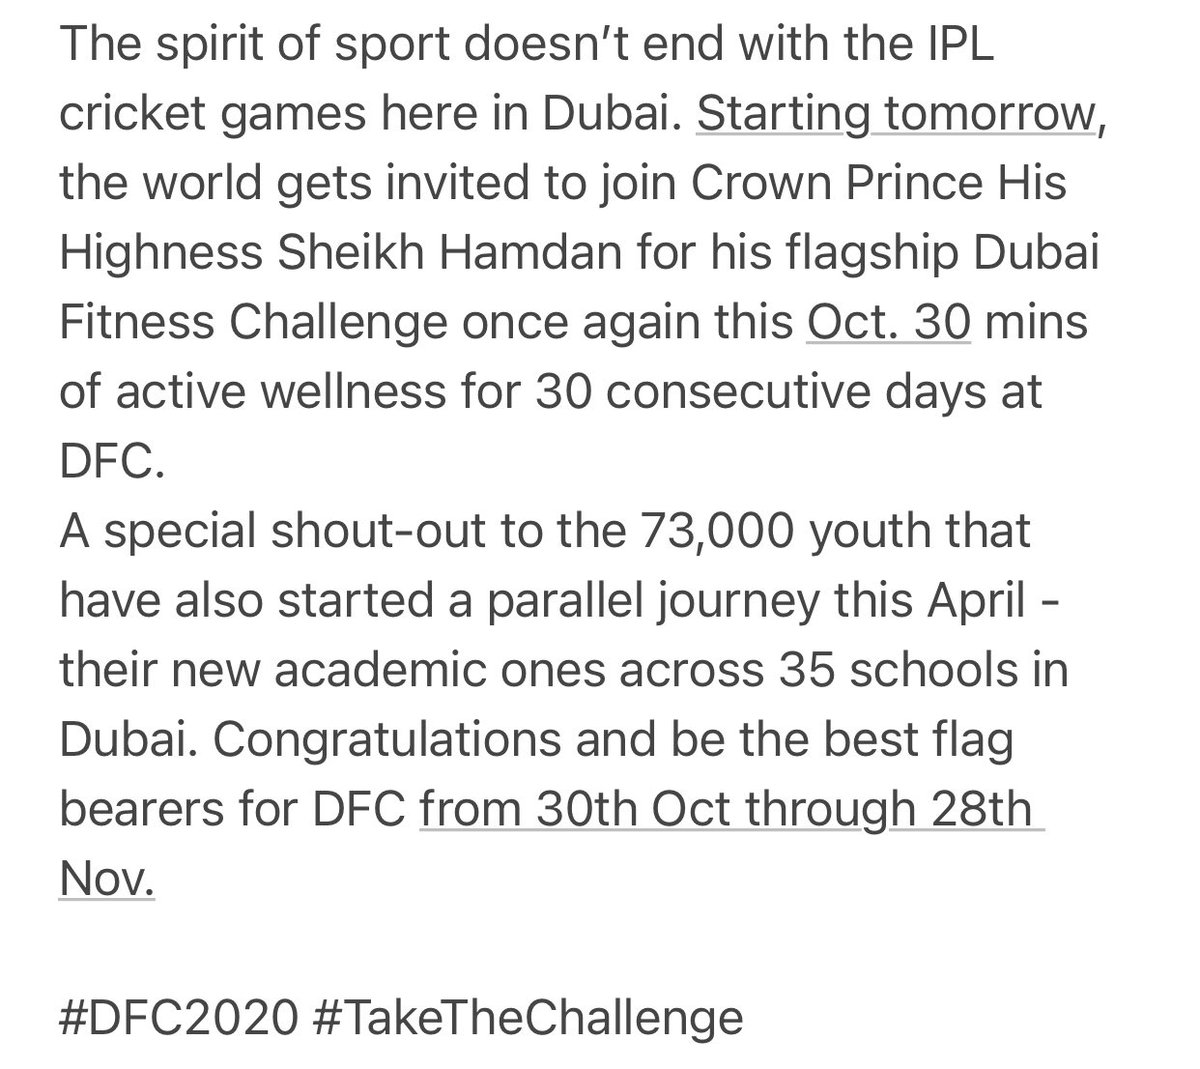 #DFC2020 #TakeTheChallenge